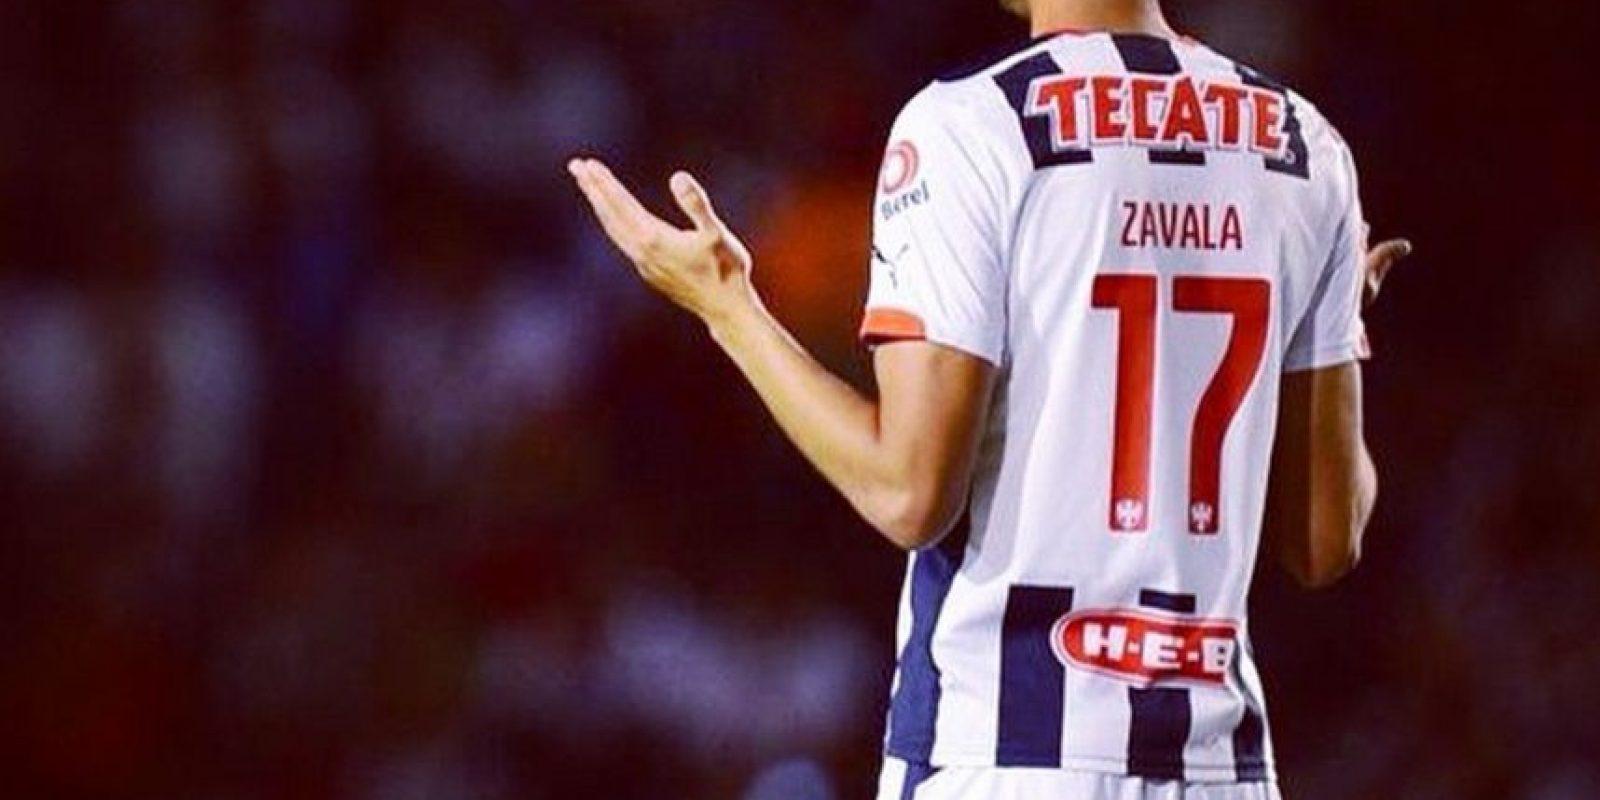 Zavala mostró el daño en las redes sociales Foto:Via twitter.com/jzavala17